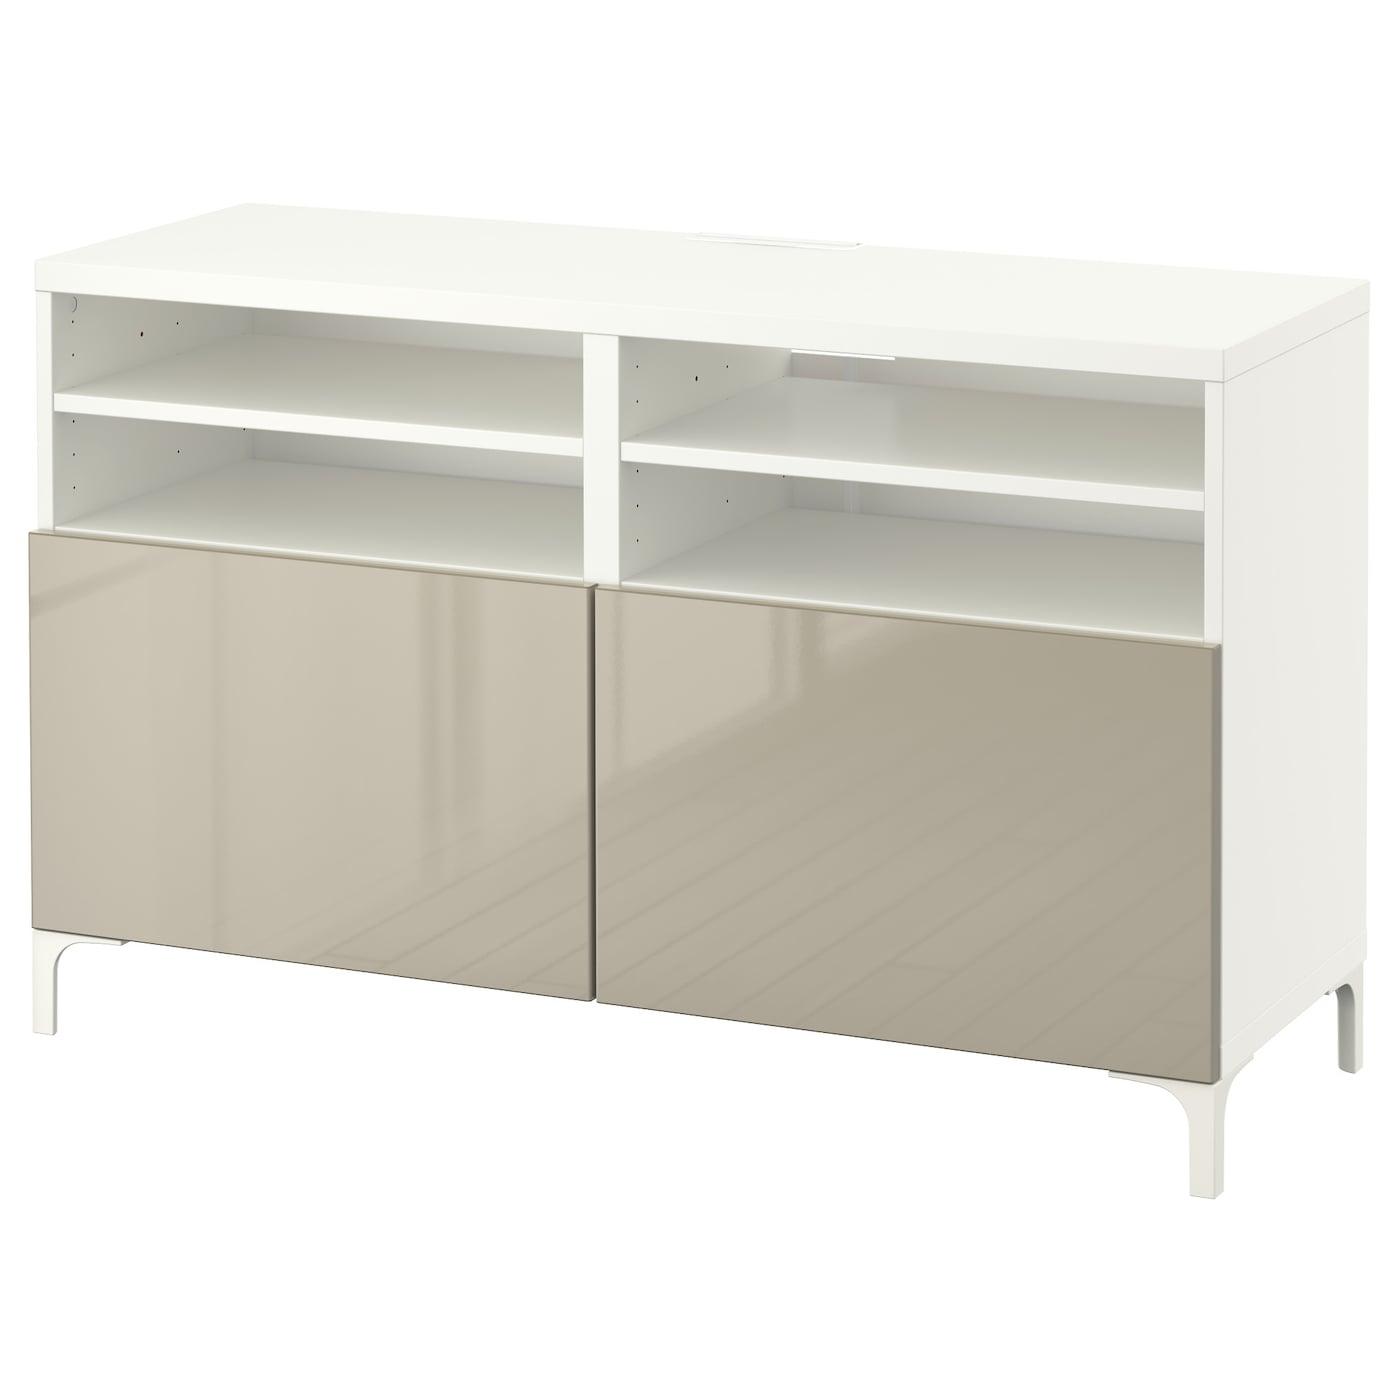 Meubles Tv Design Scandinave Pas Cher Ikea